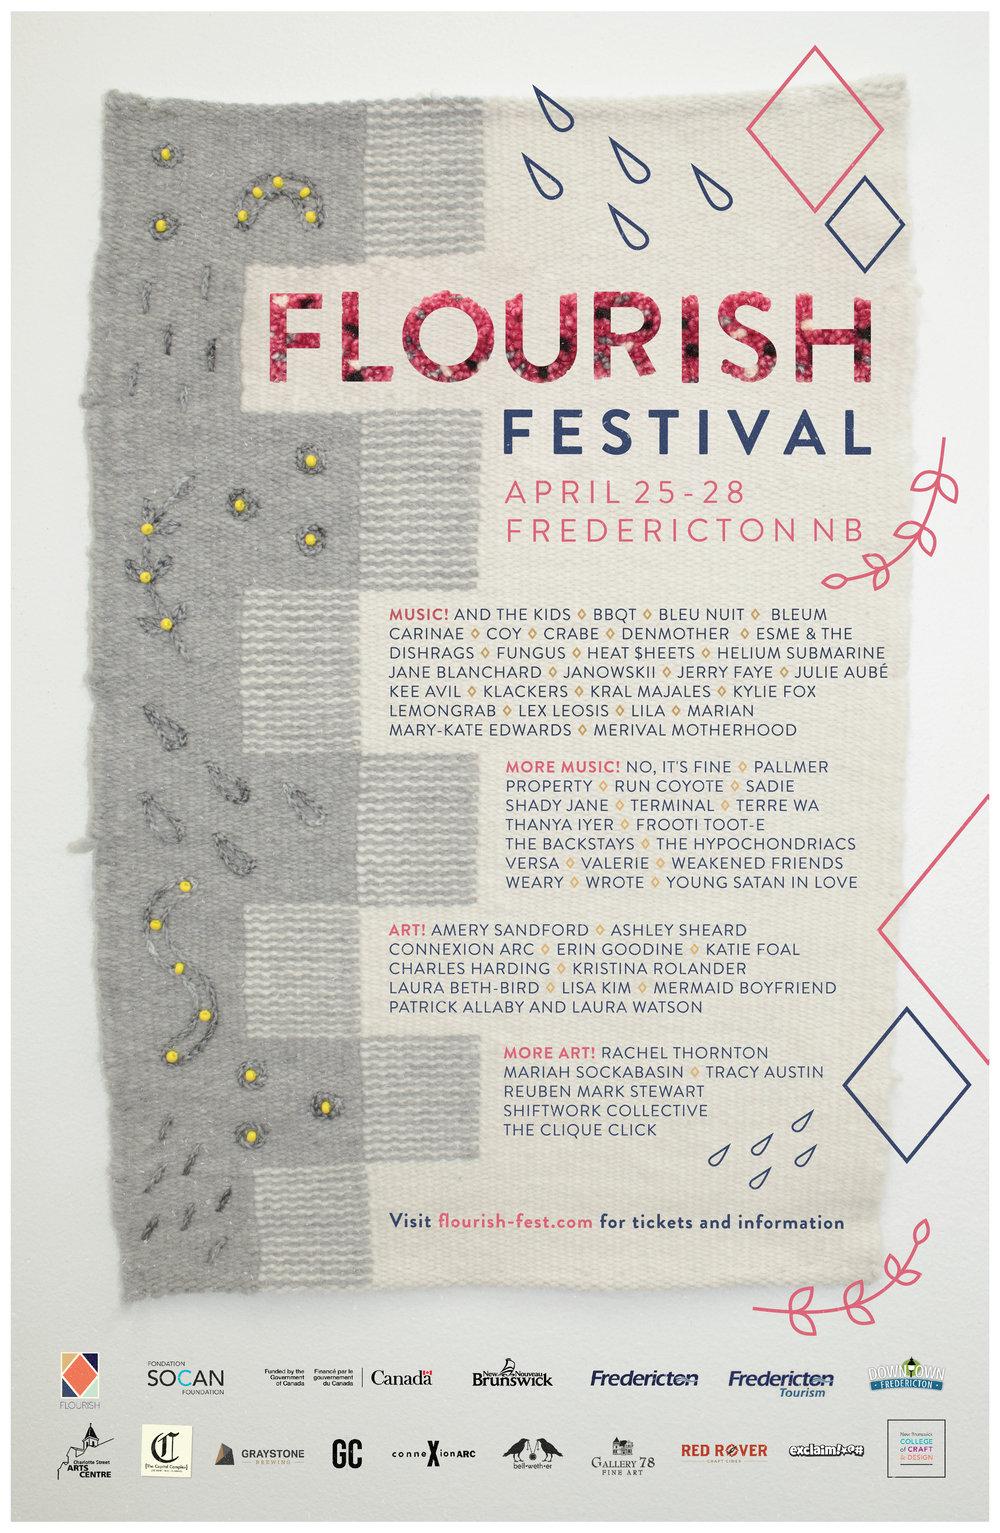 FLOURISH FESTIVAL 2019 - Poster by Robin Goodine & Emily Blair (textiles) & Erin Goodine (graphics)